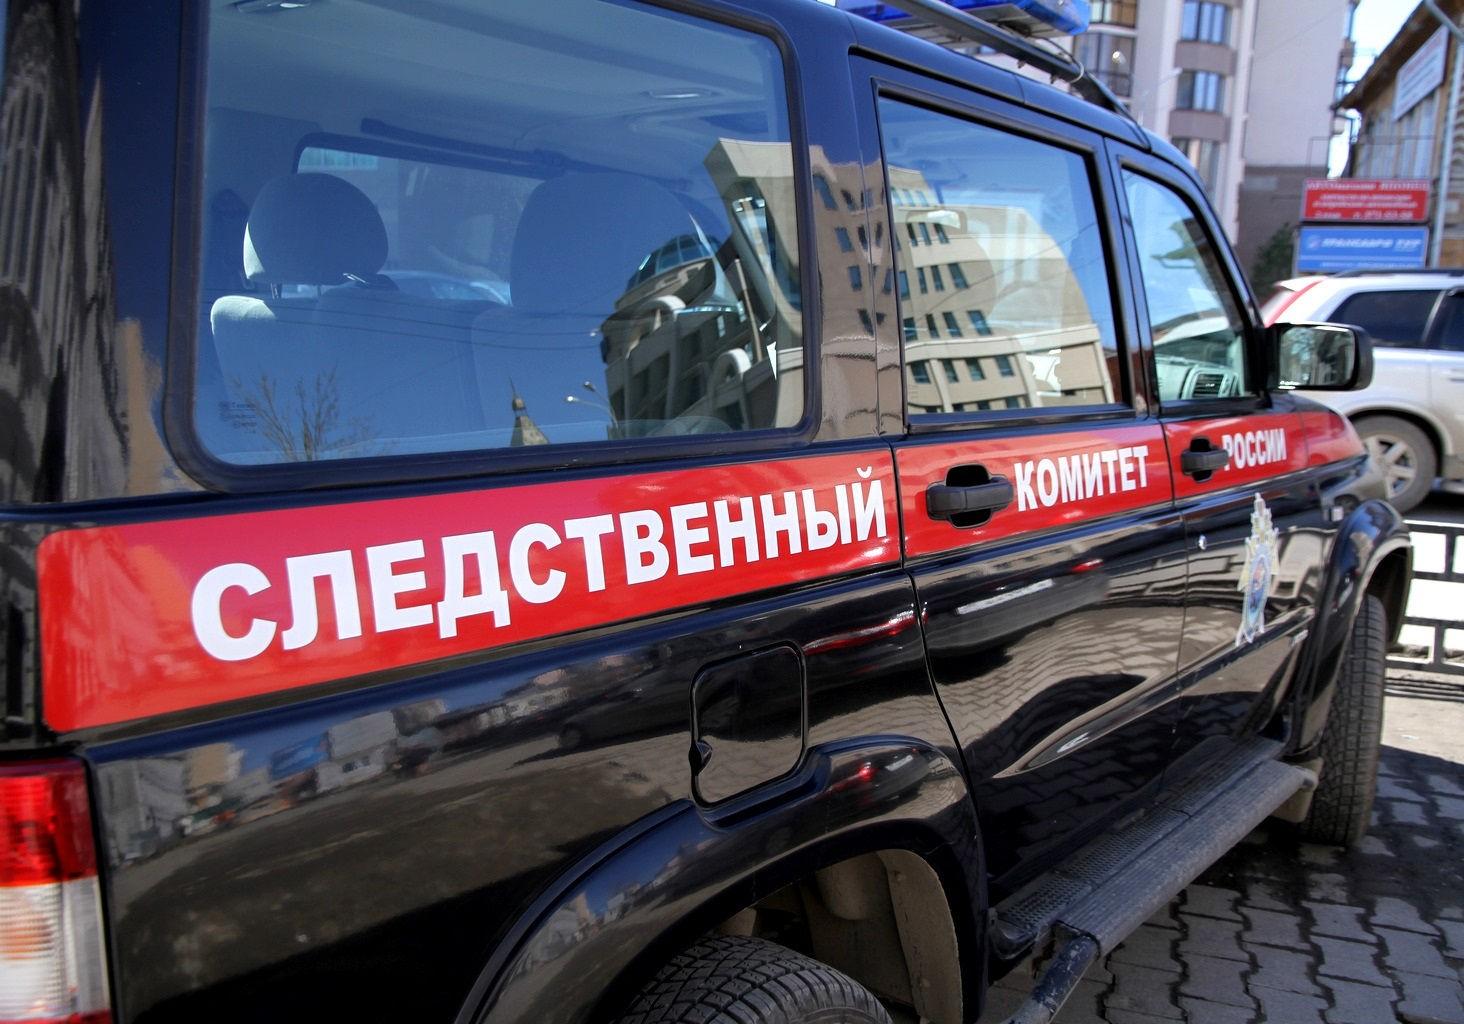 ВКомсомольске-на-Амуре наберегу реки найдены тела 3-х мужчин